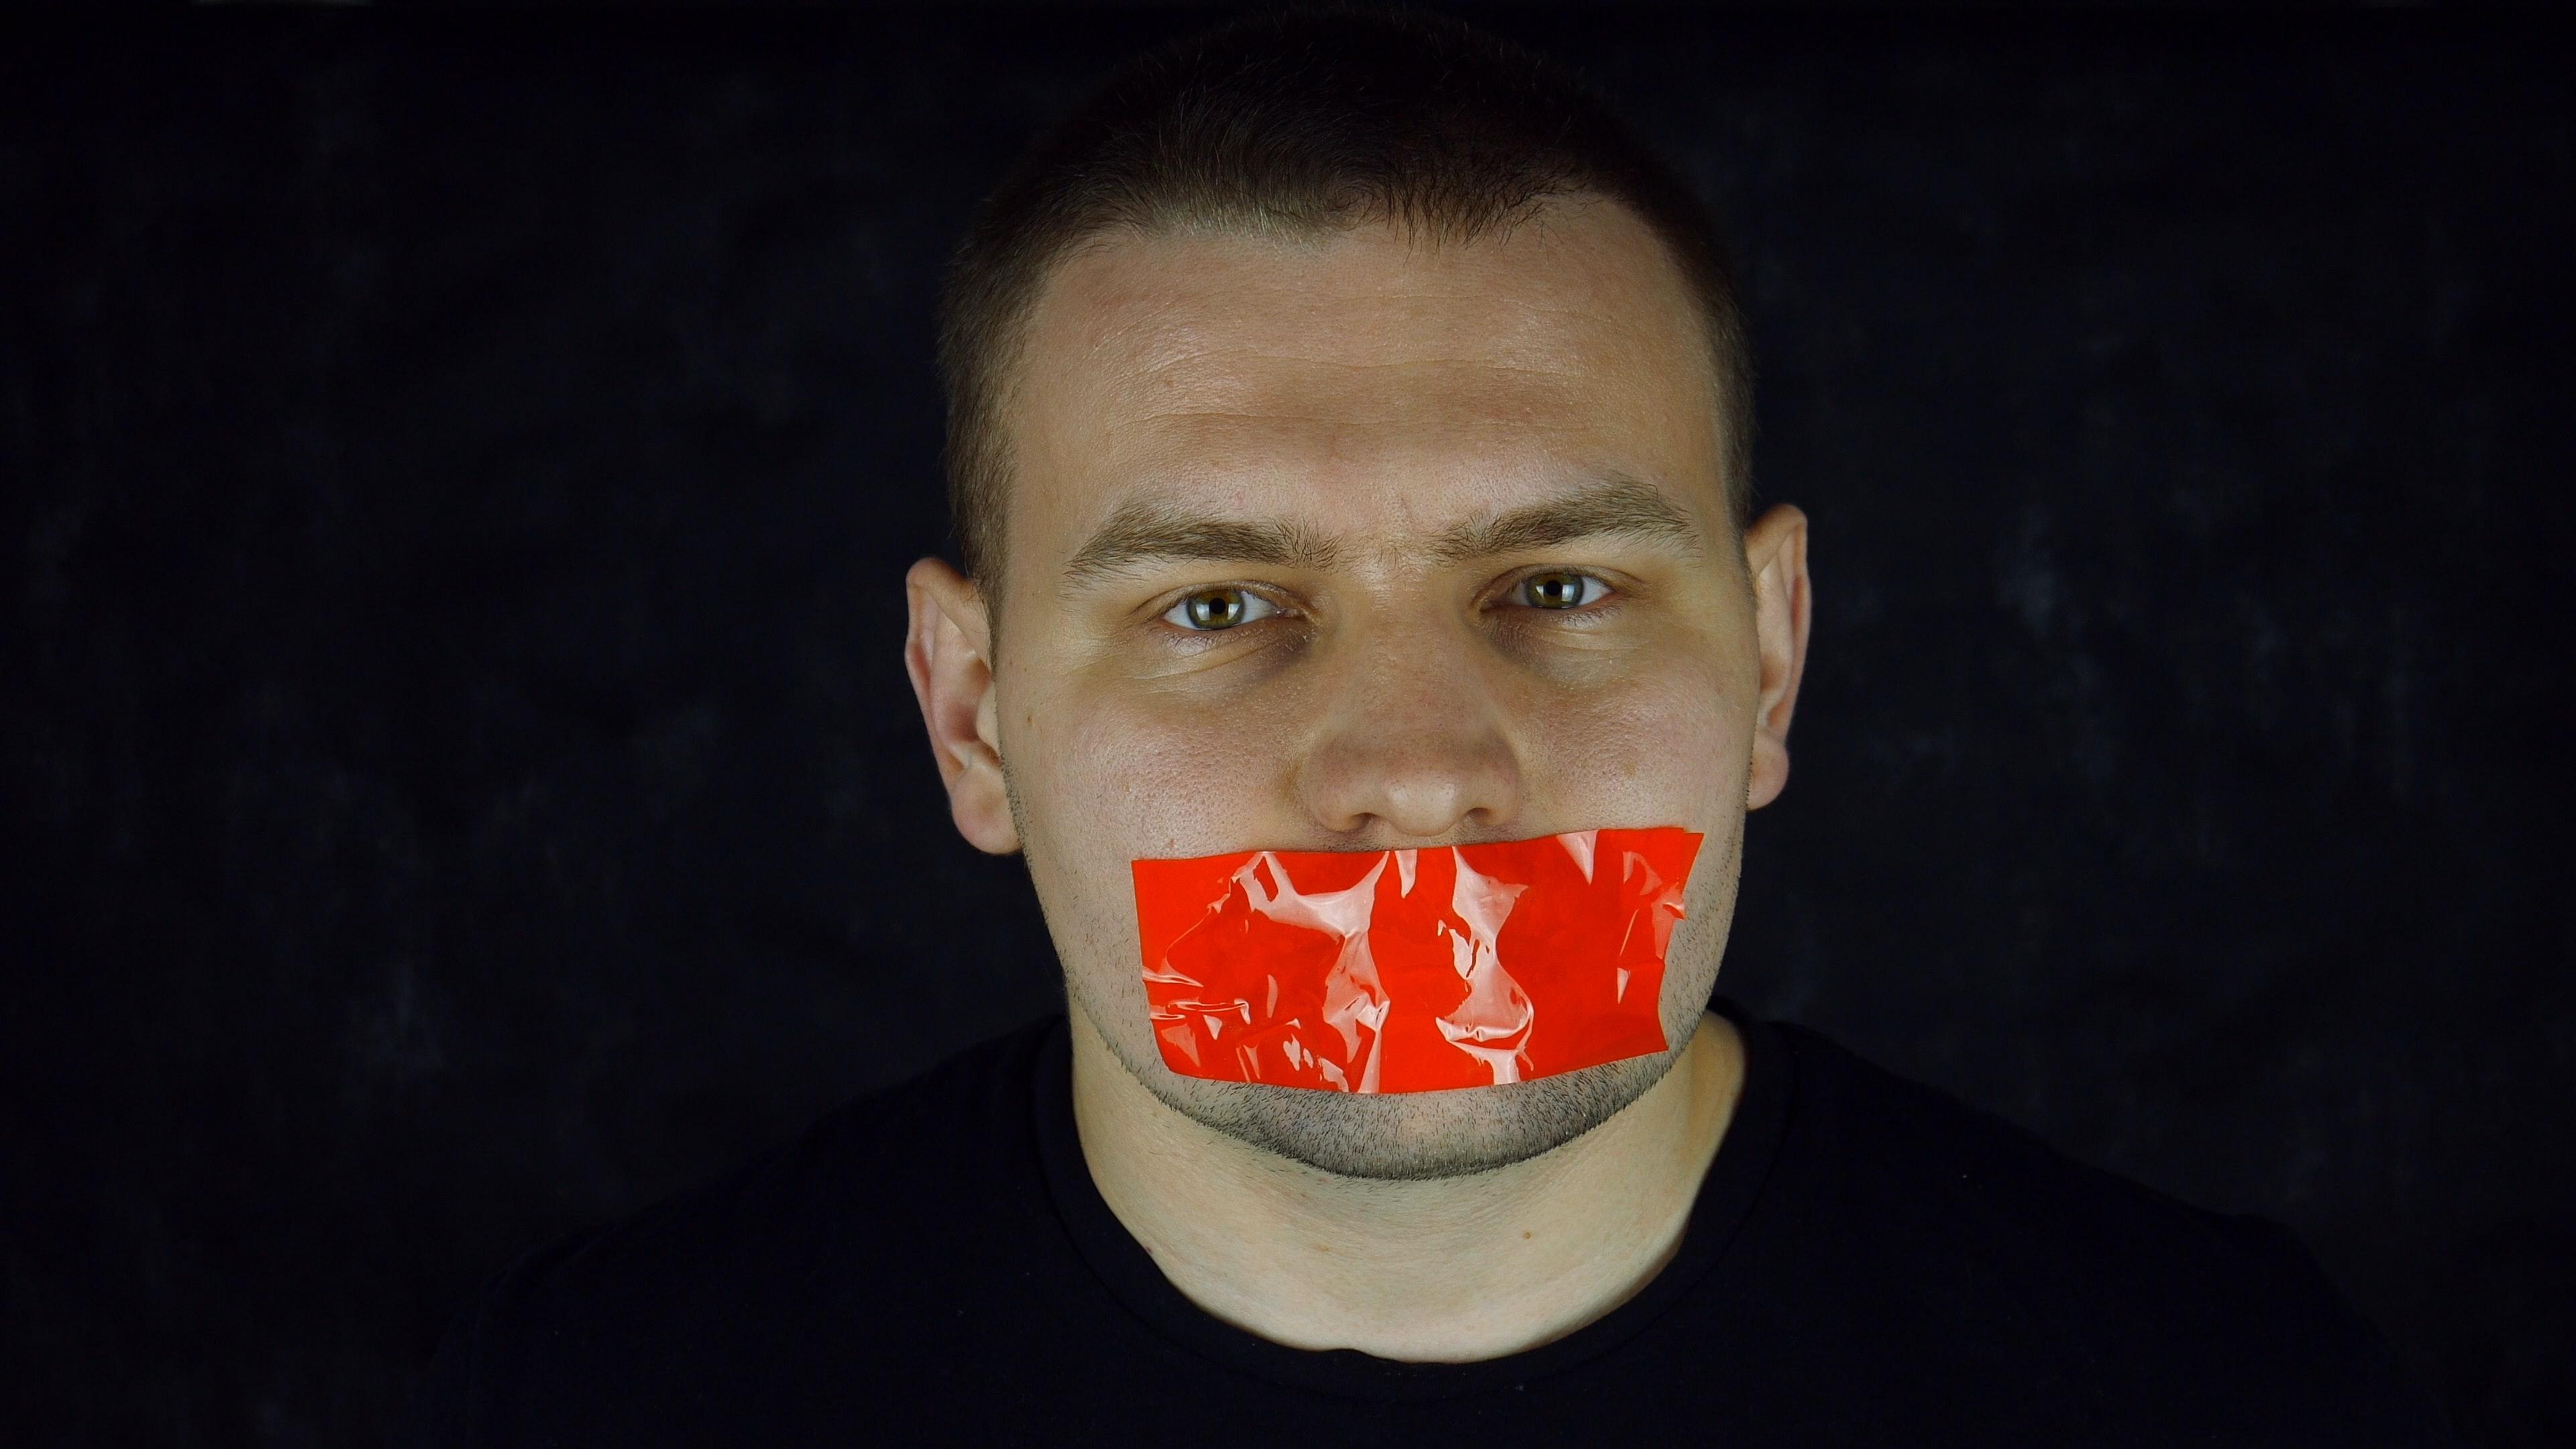 man mouth tape